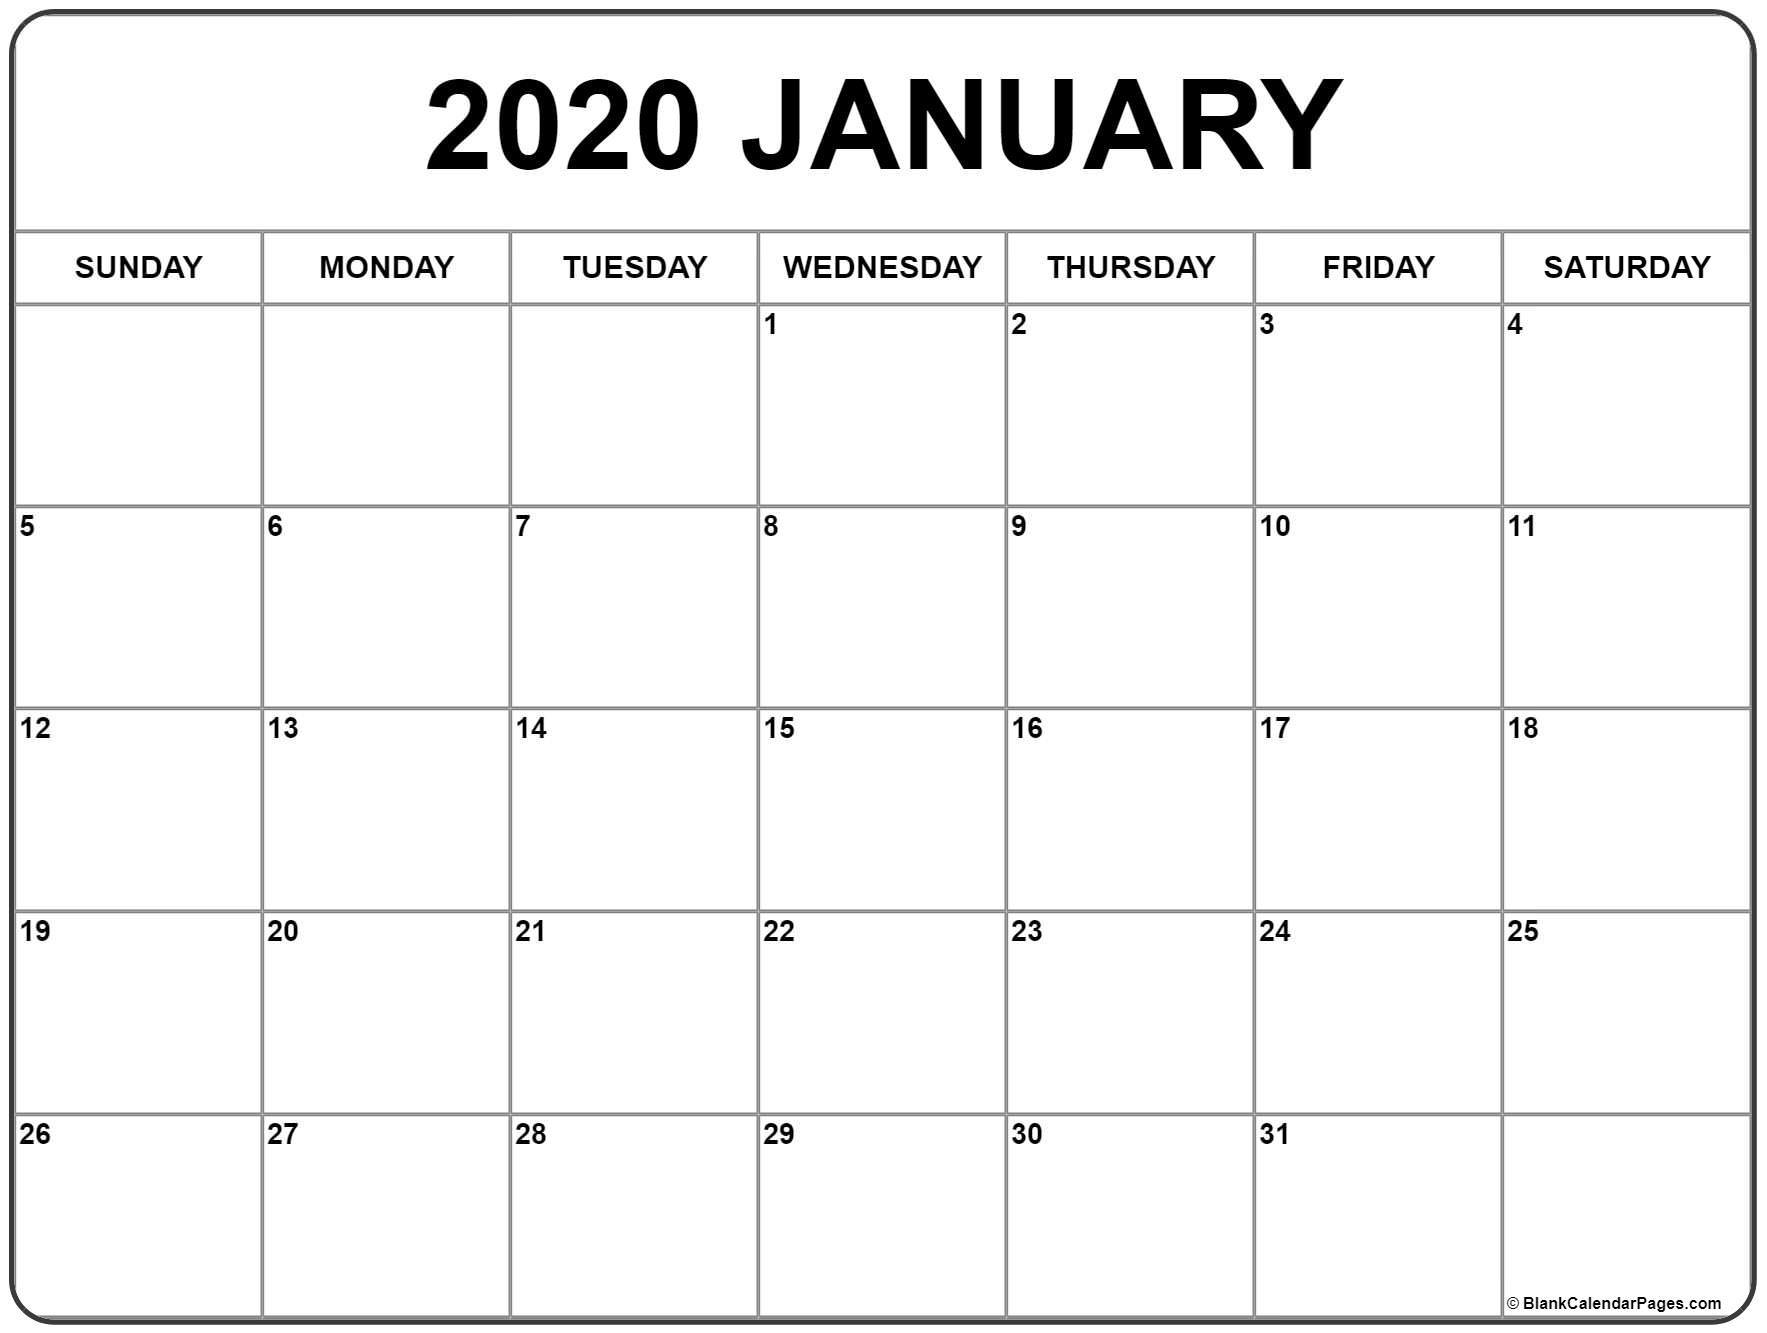 January 2020 Calendar | Free Printable Monthly Calendars-Show Me January 2020 Calendar